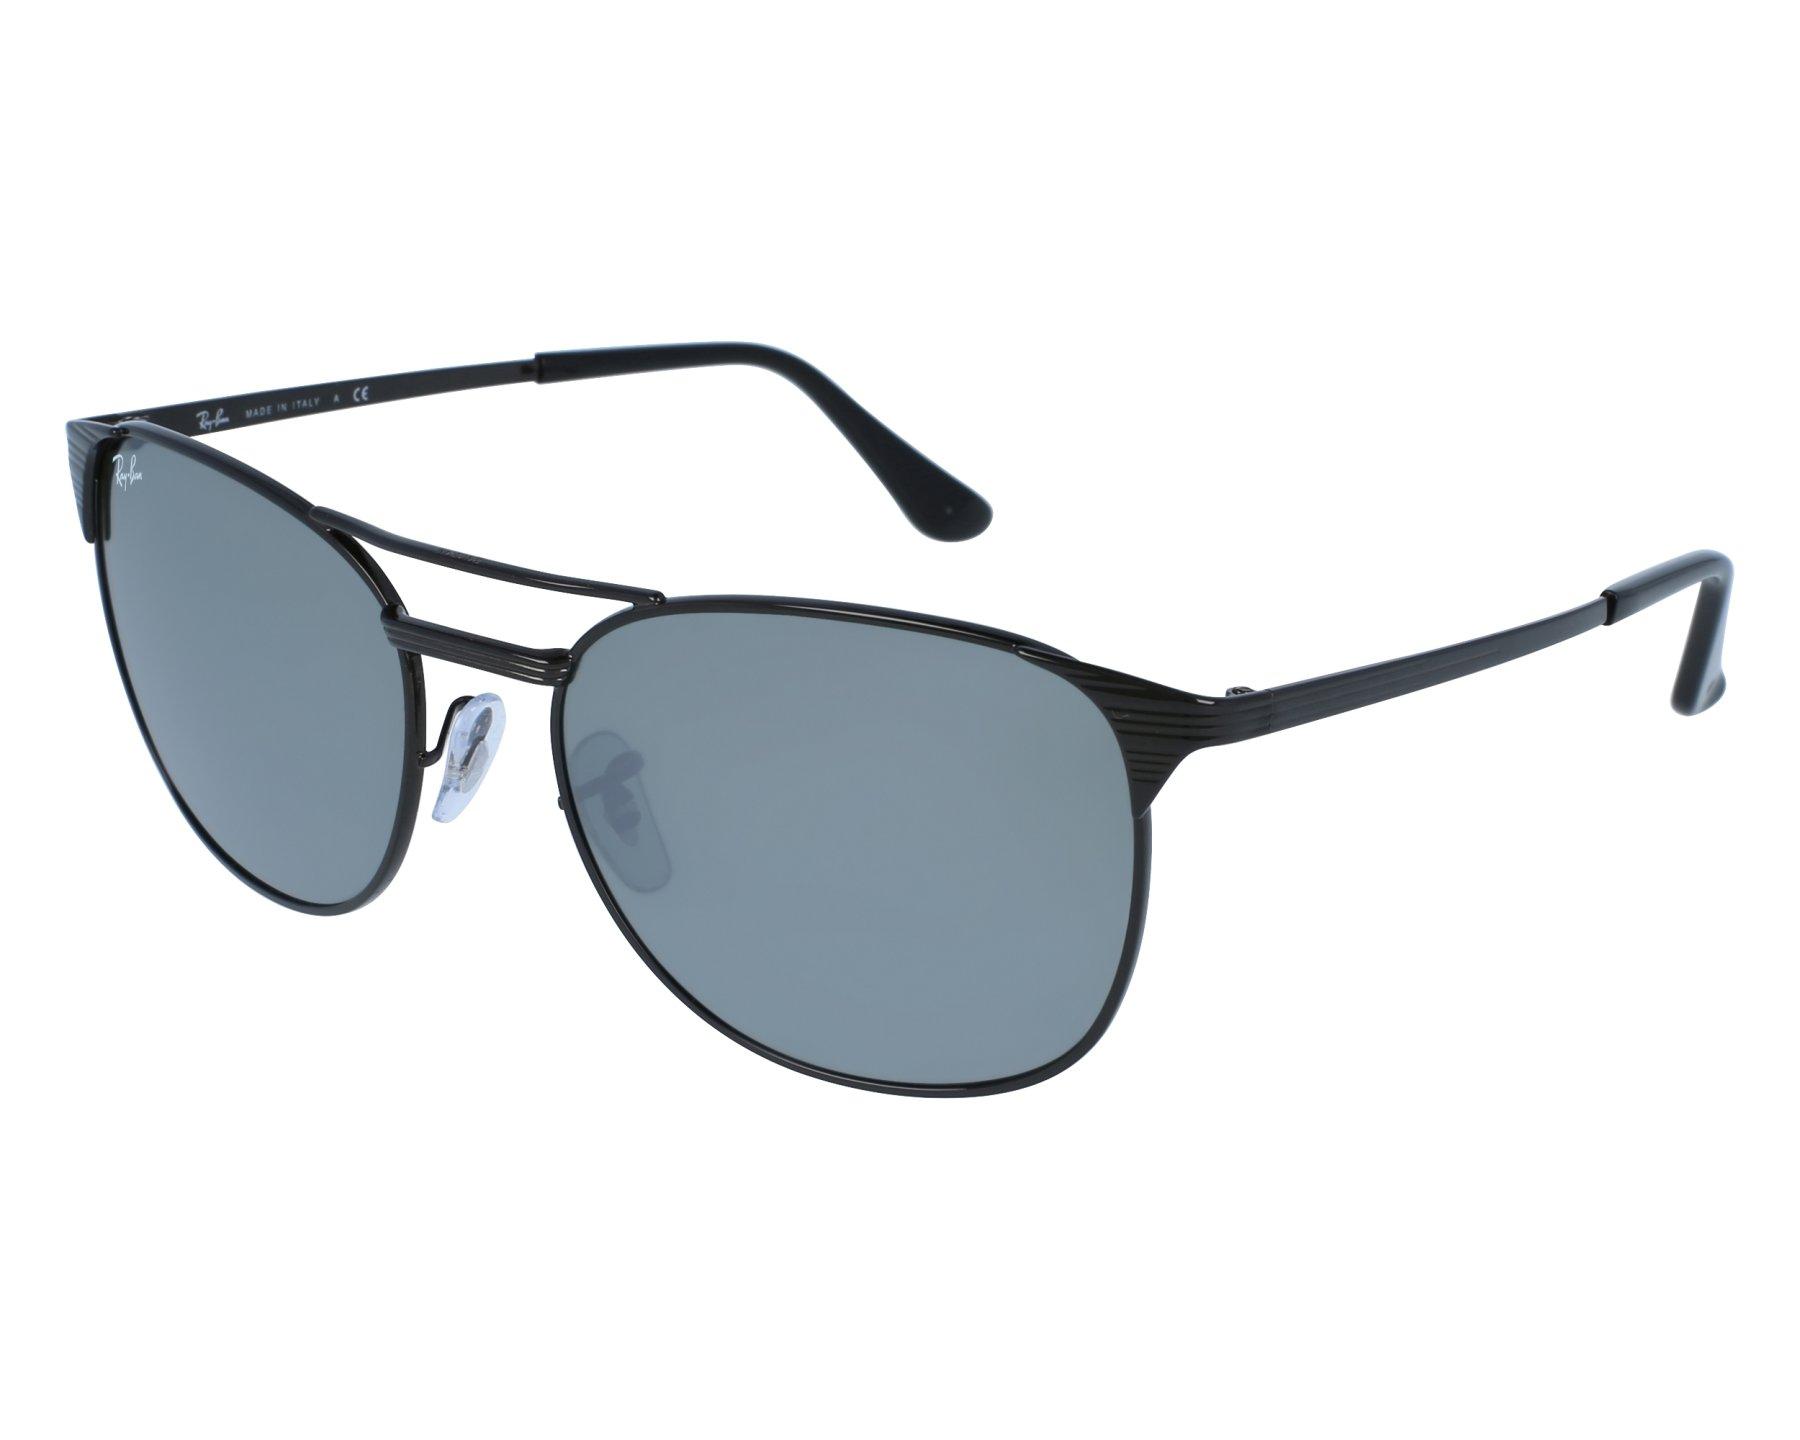 3fb907a50e0 Sunglasses Ray-Ban RB-3429-M 002 40 58-19 Black